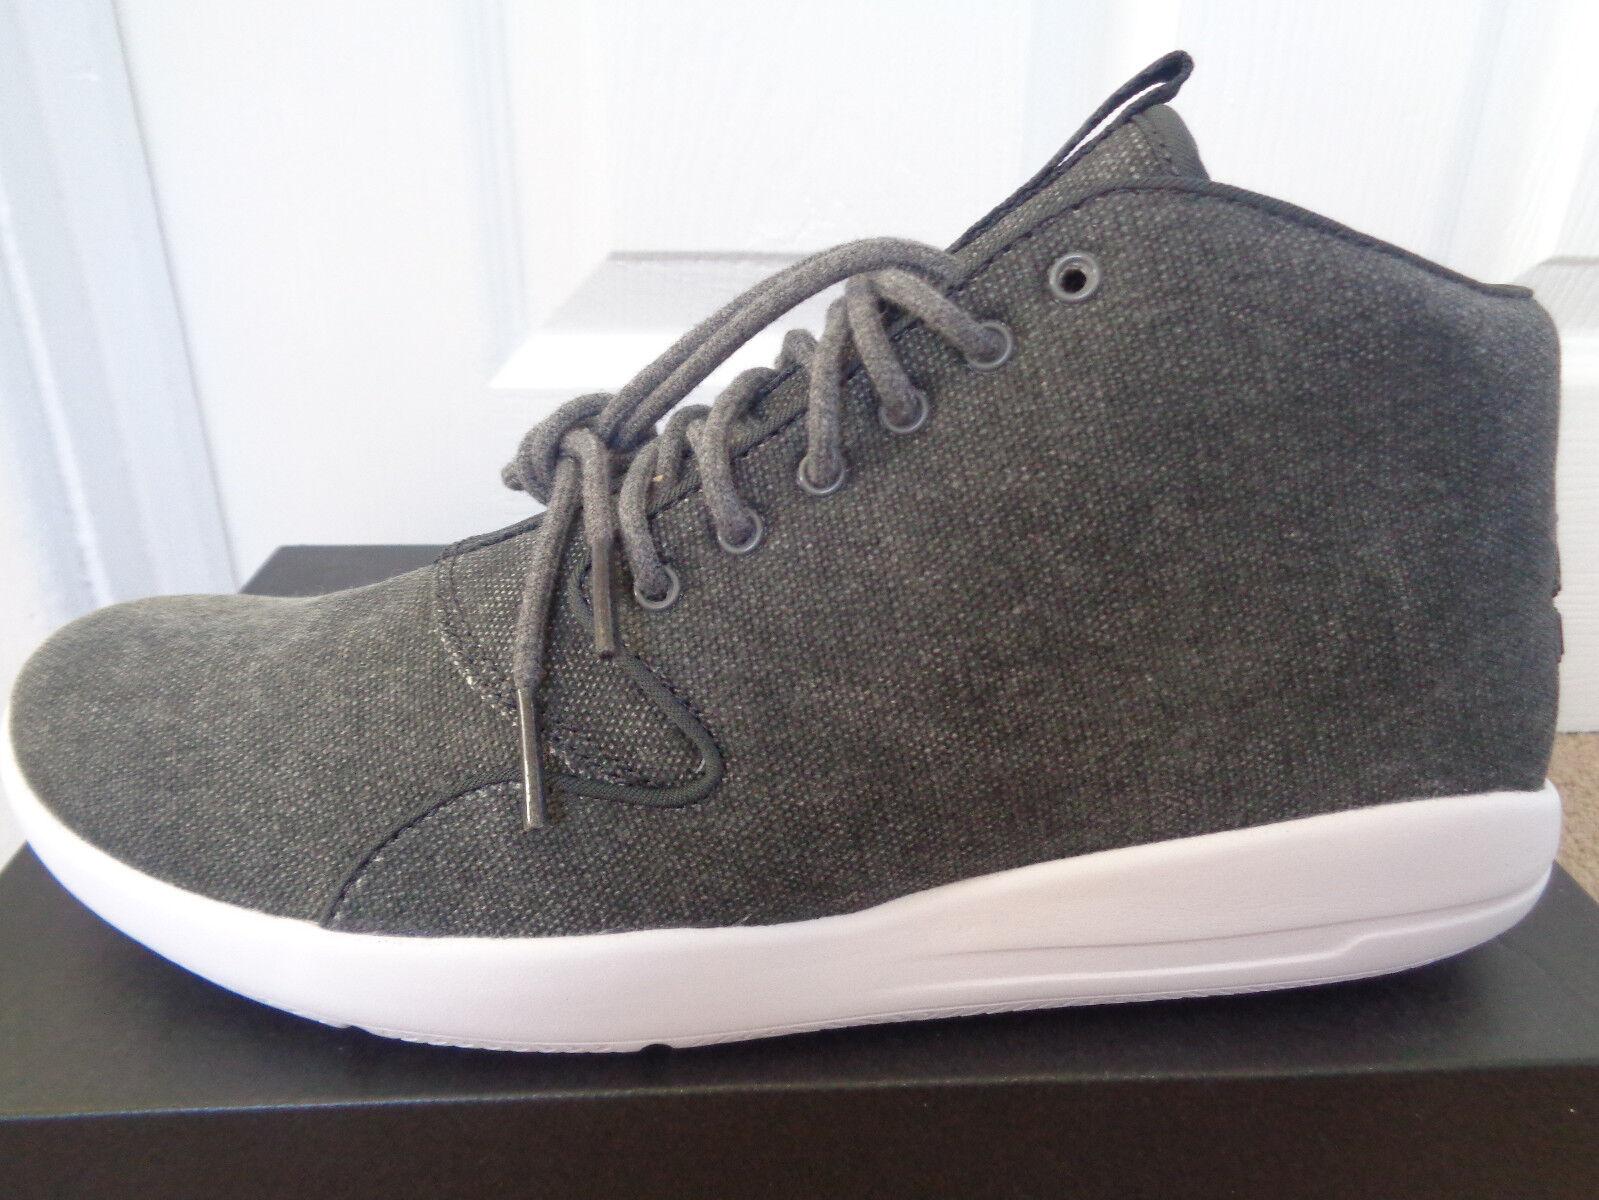 Nike Air Jordan eclipse chukka trainers 881453 006 eu 42 us 8.5 NEW+BOX